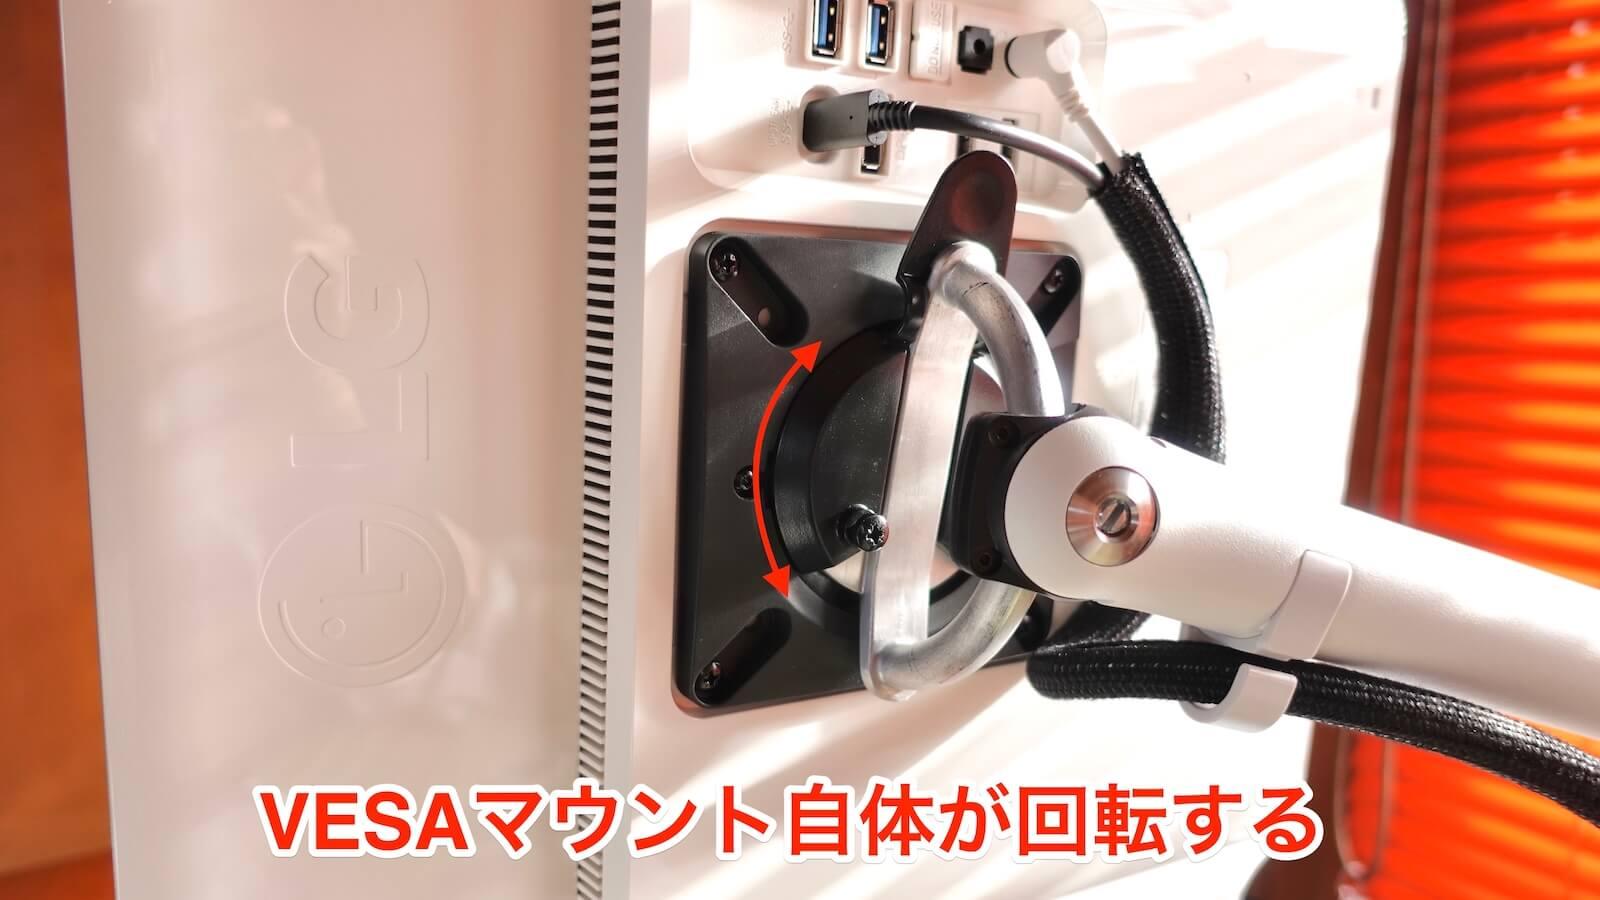 Herman Miller Flo Monitor Arm VESA mount rotation